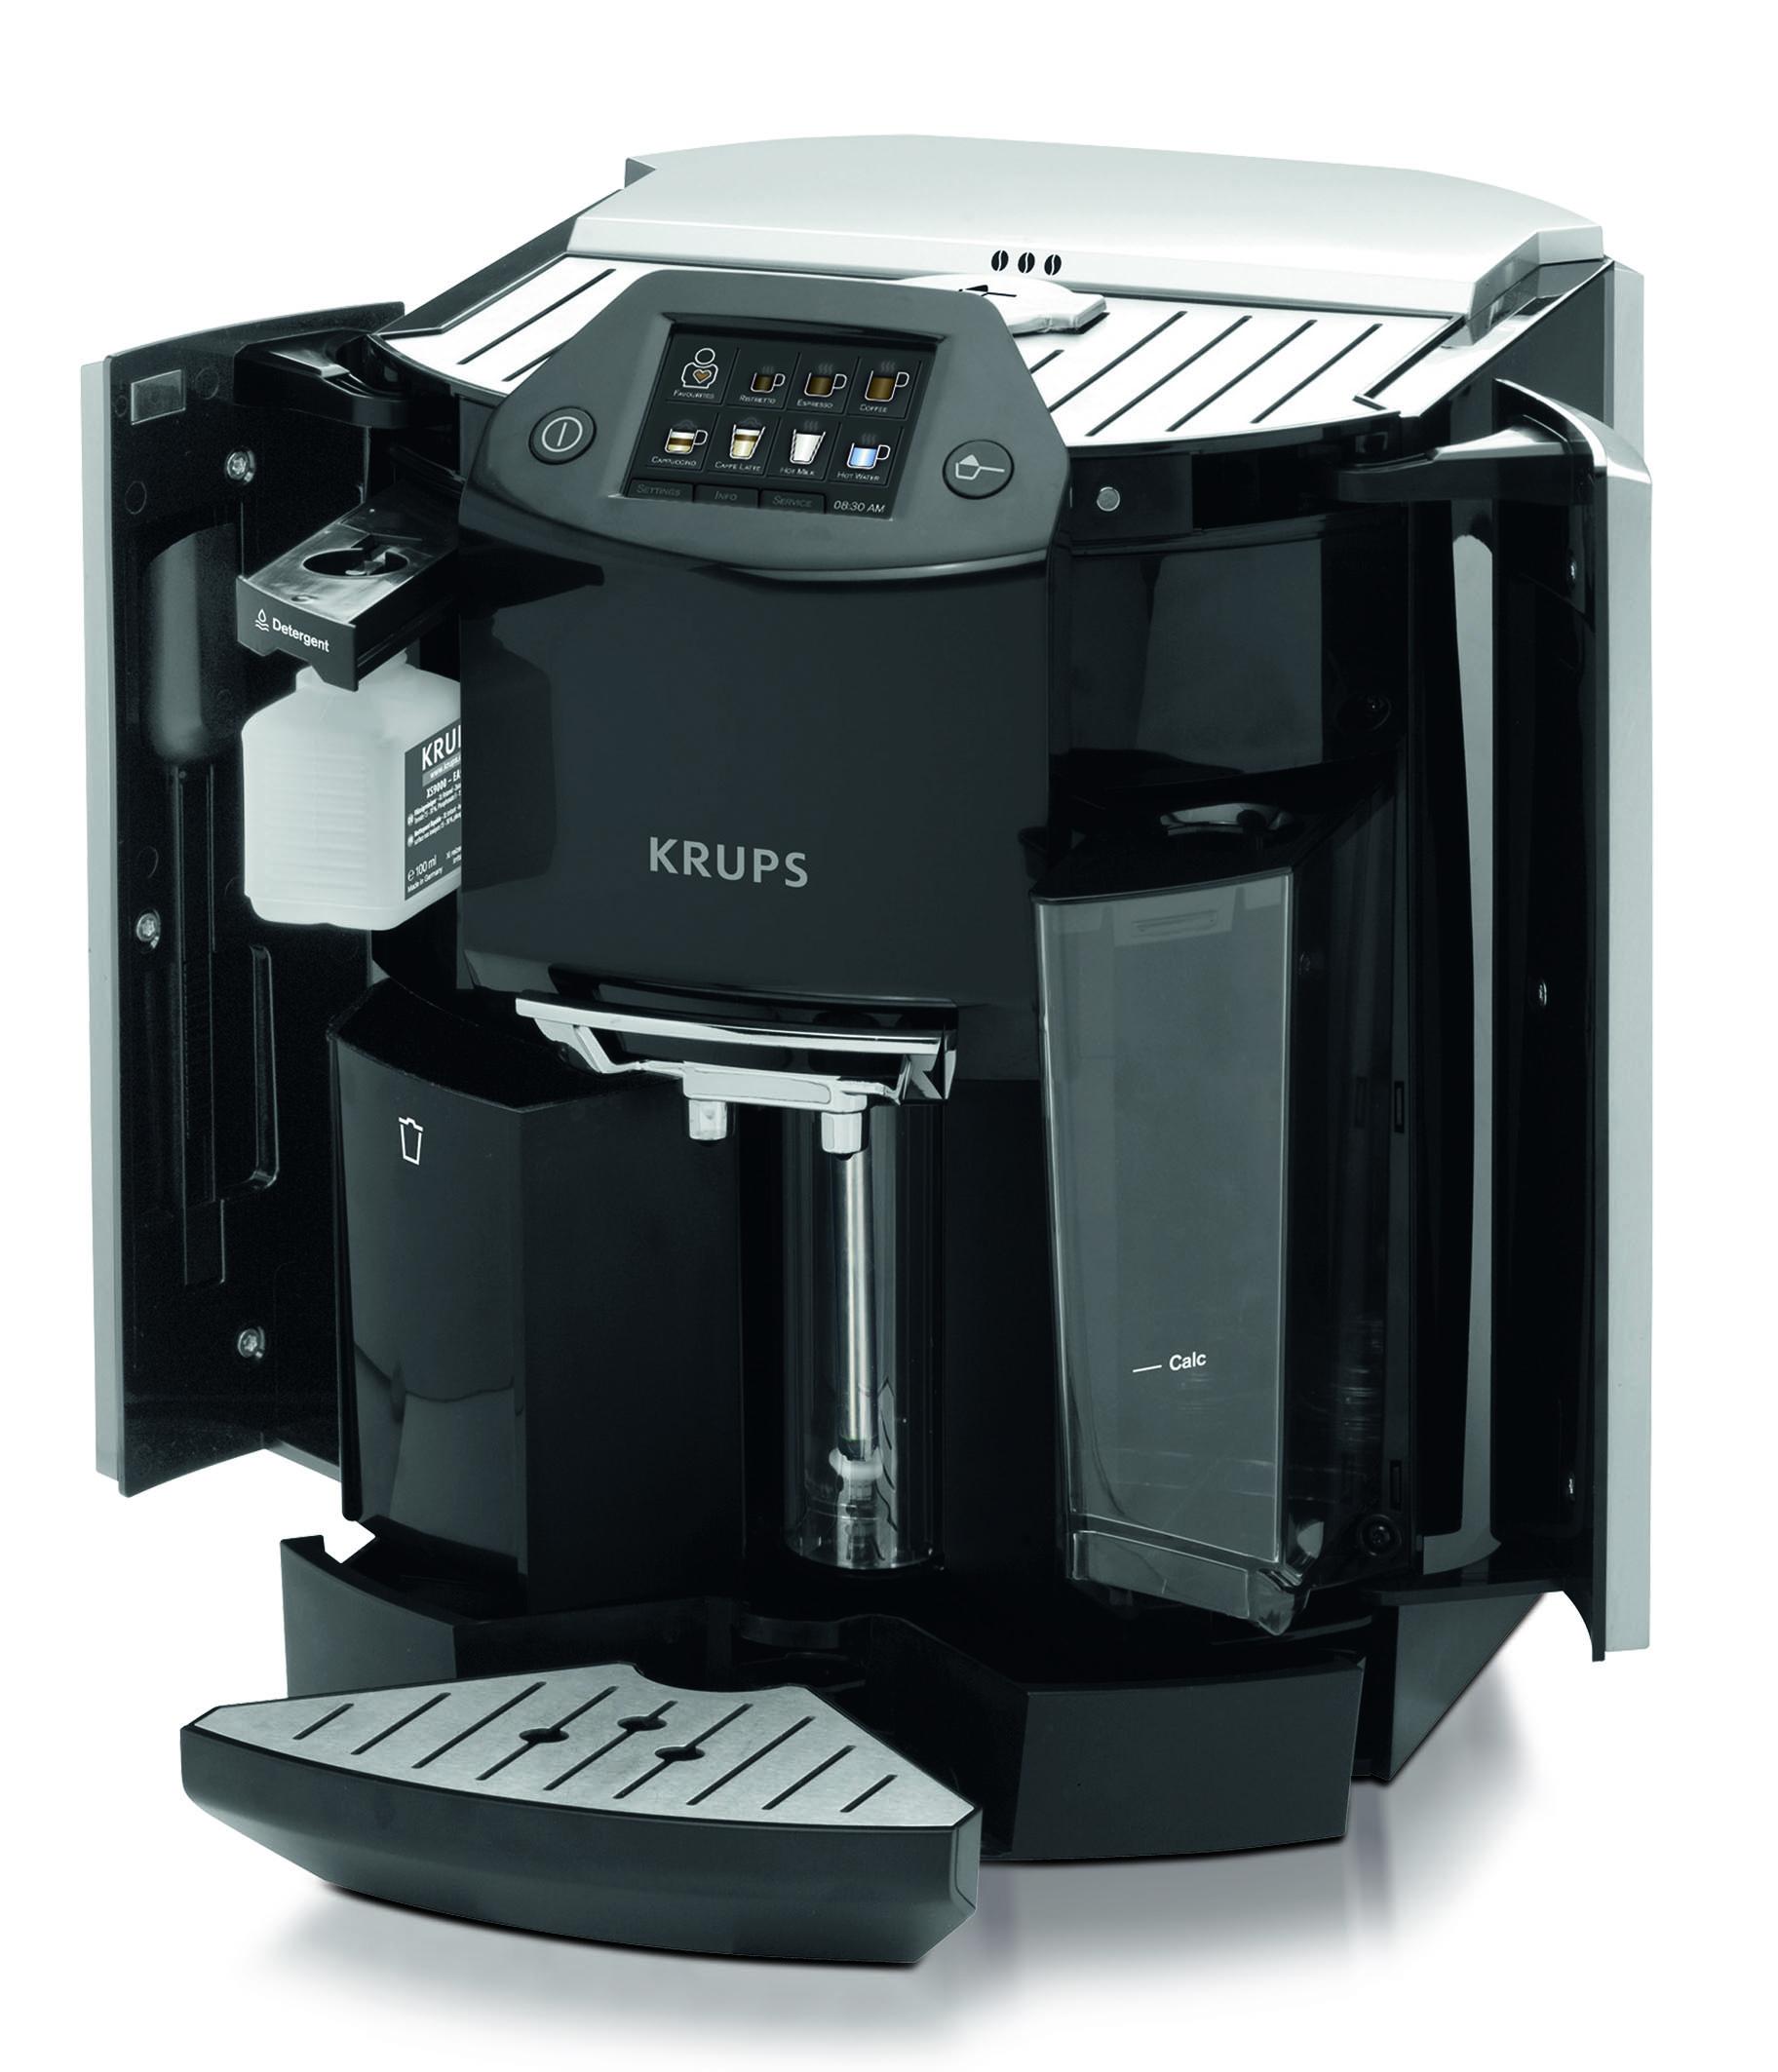 krups ea 9000 offen krups ea 9000 kaffeevollautomat mit one touch bedienung echte barista. Black Bedroom Furniture Sets. Home Design Ideas